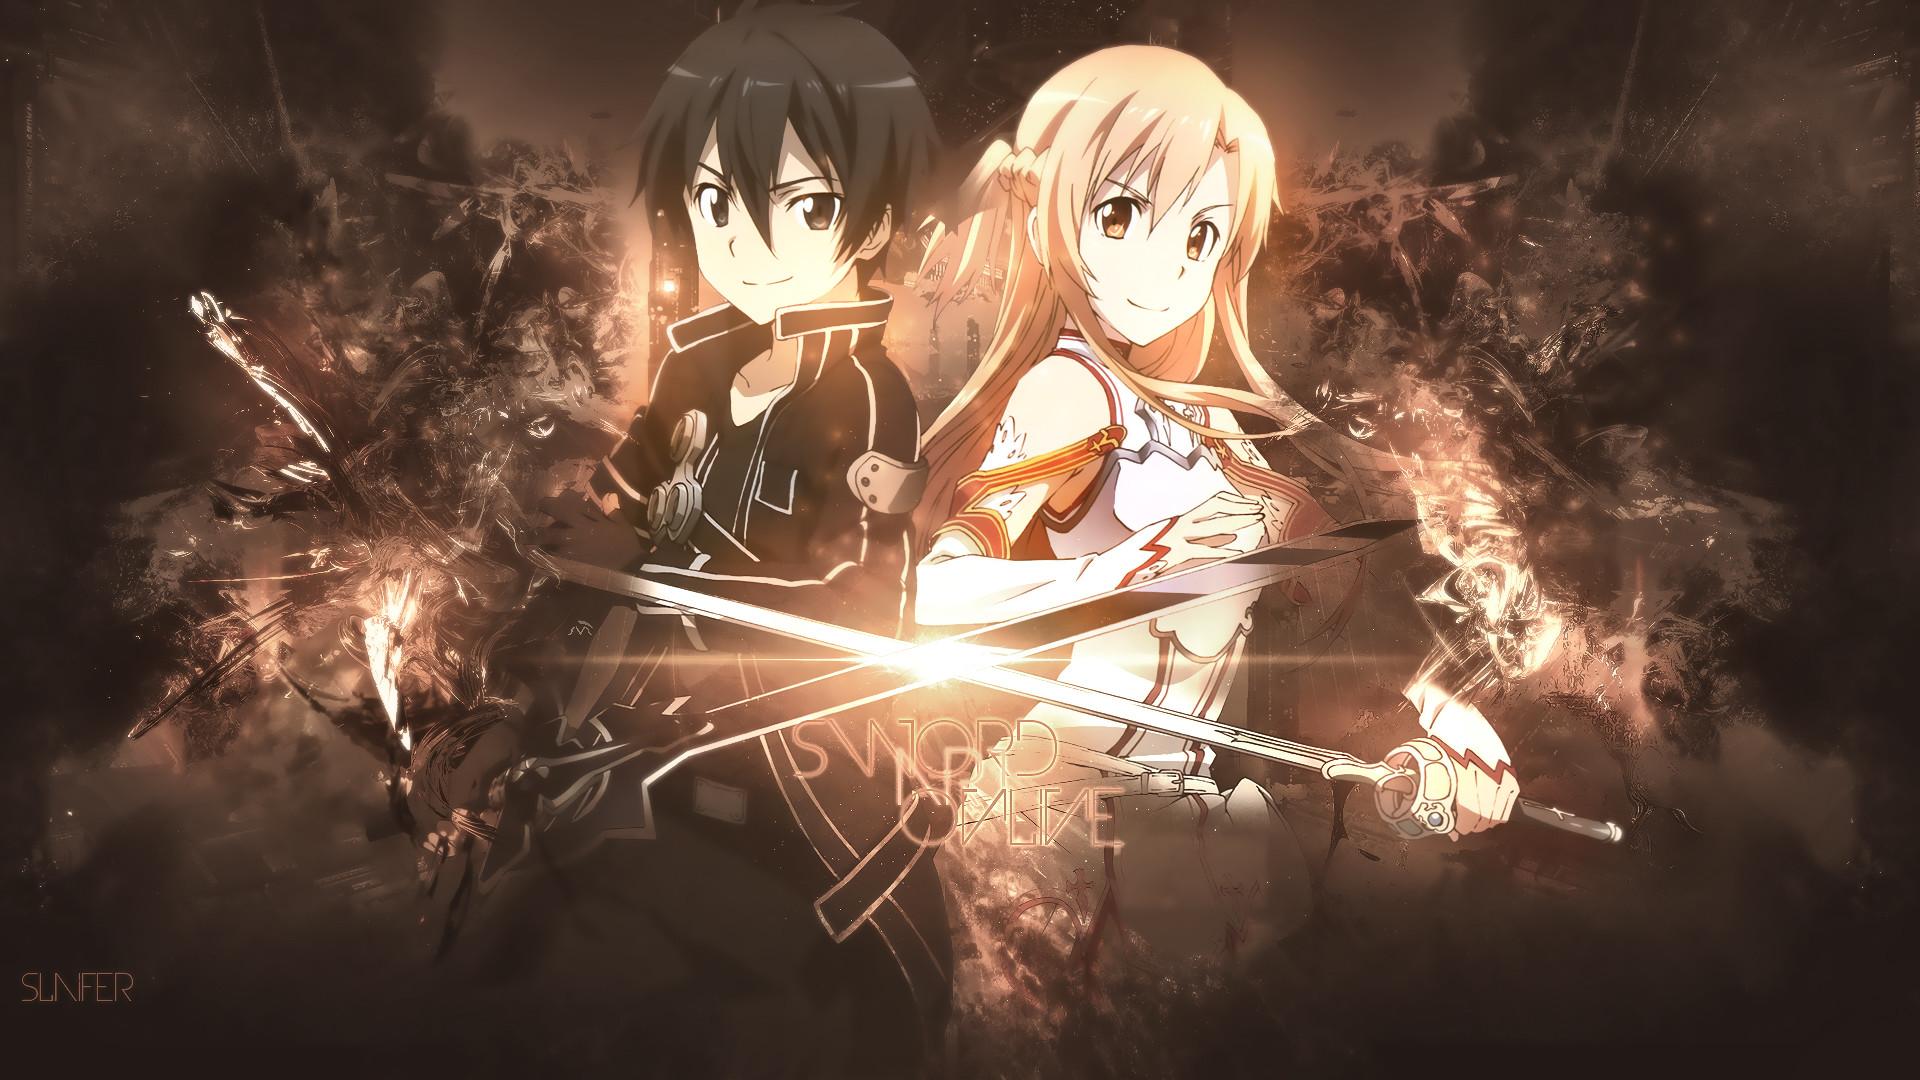 Otaku's Unite! images Sword Art Online HD wallpaper and background photos